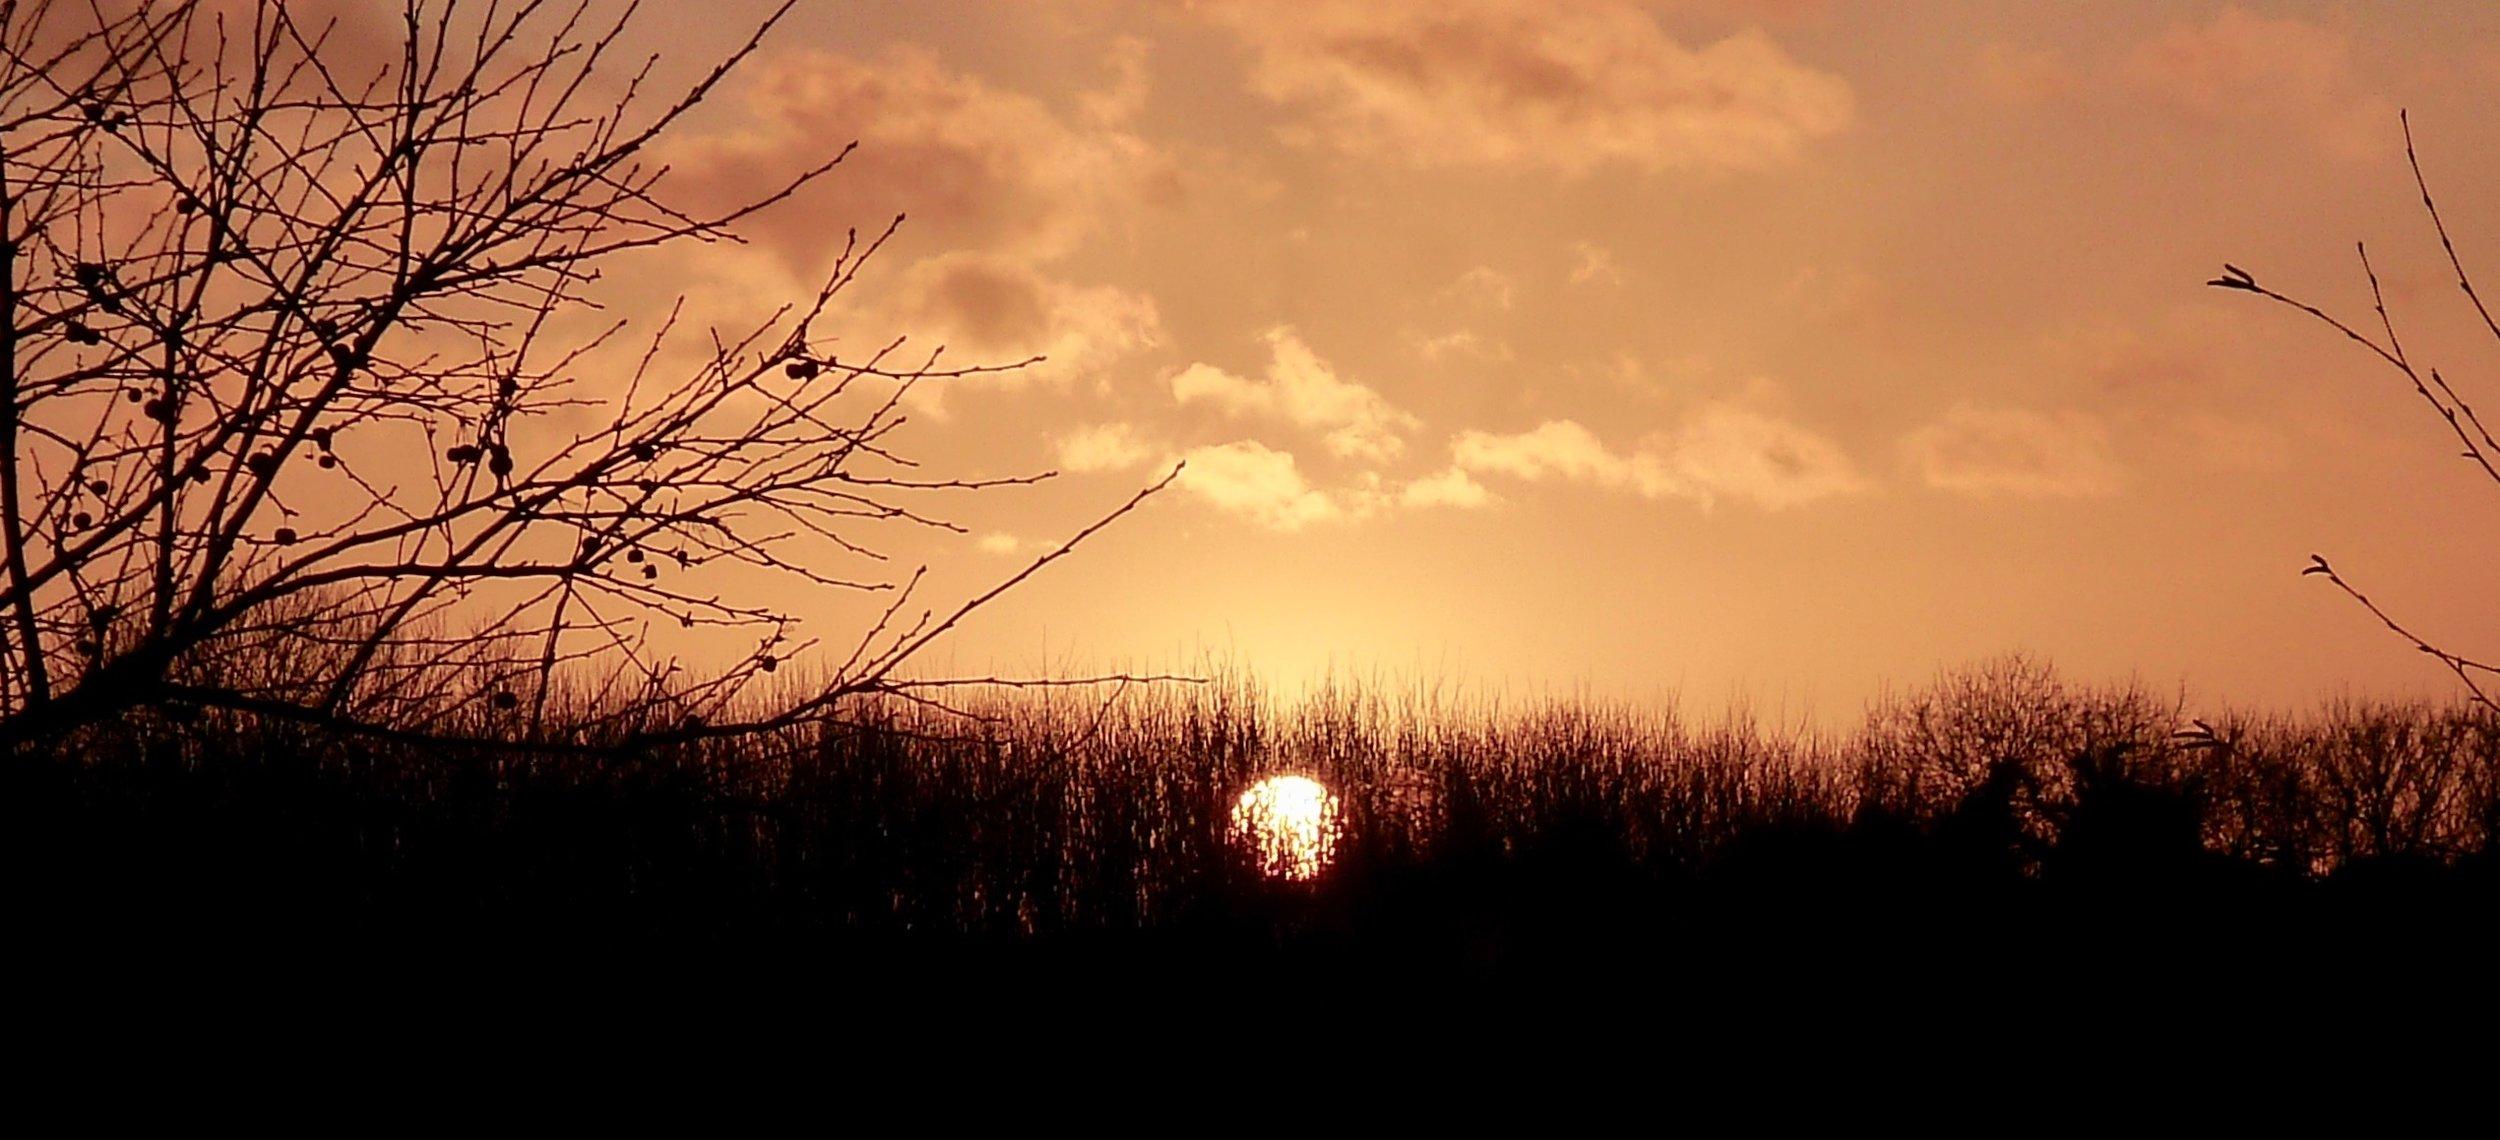 """Sun Hedged"" © June 2015  mariannenishifue.com  9:45 PM Enniscorthy Ireland"